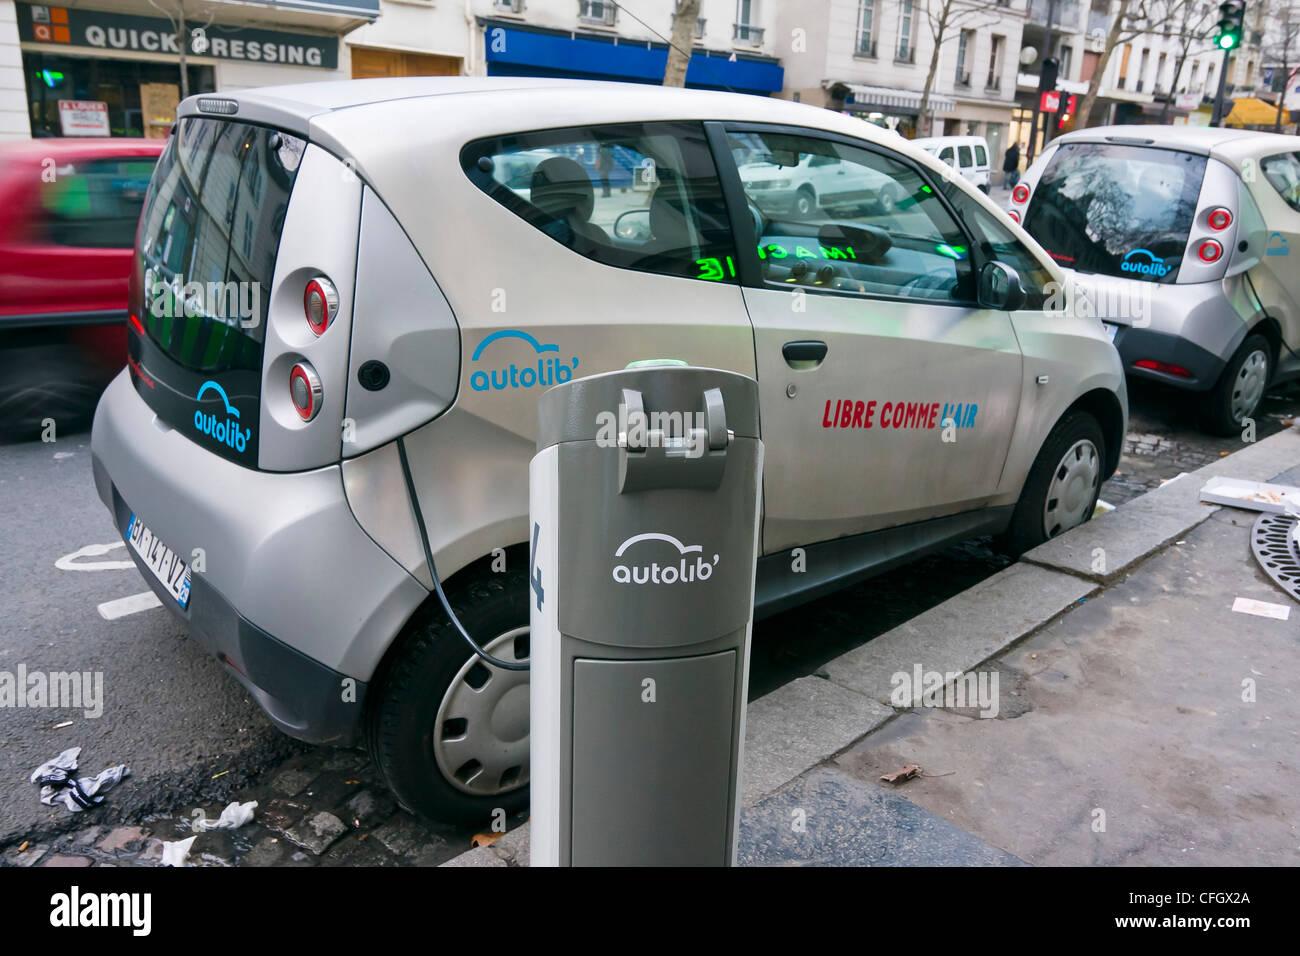 Electric Car Rental >> Autolib Self Service Electric Car Rental Paris France Stock